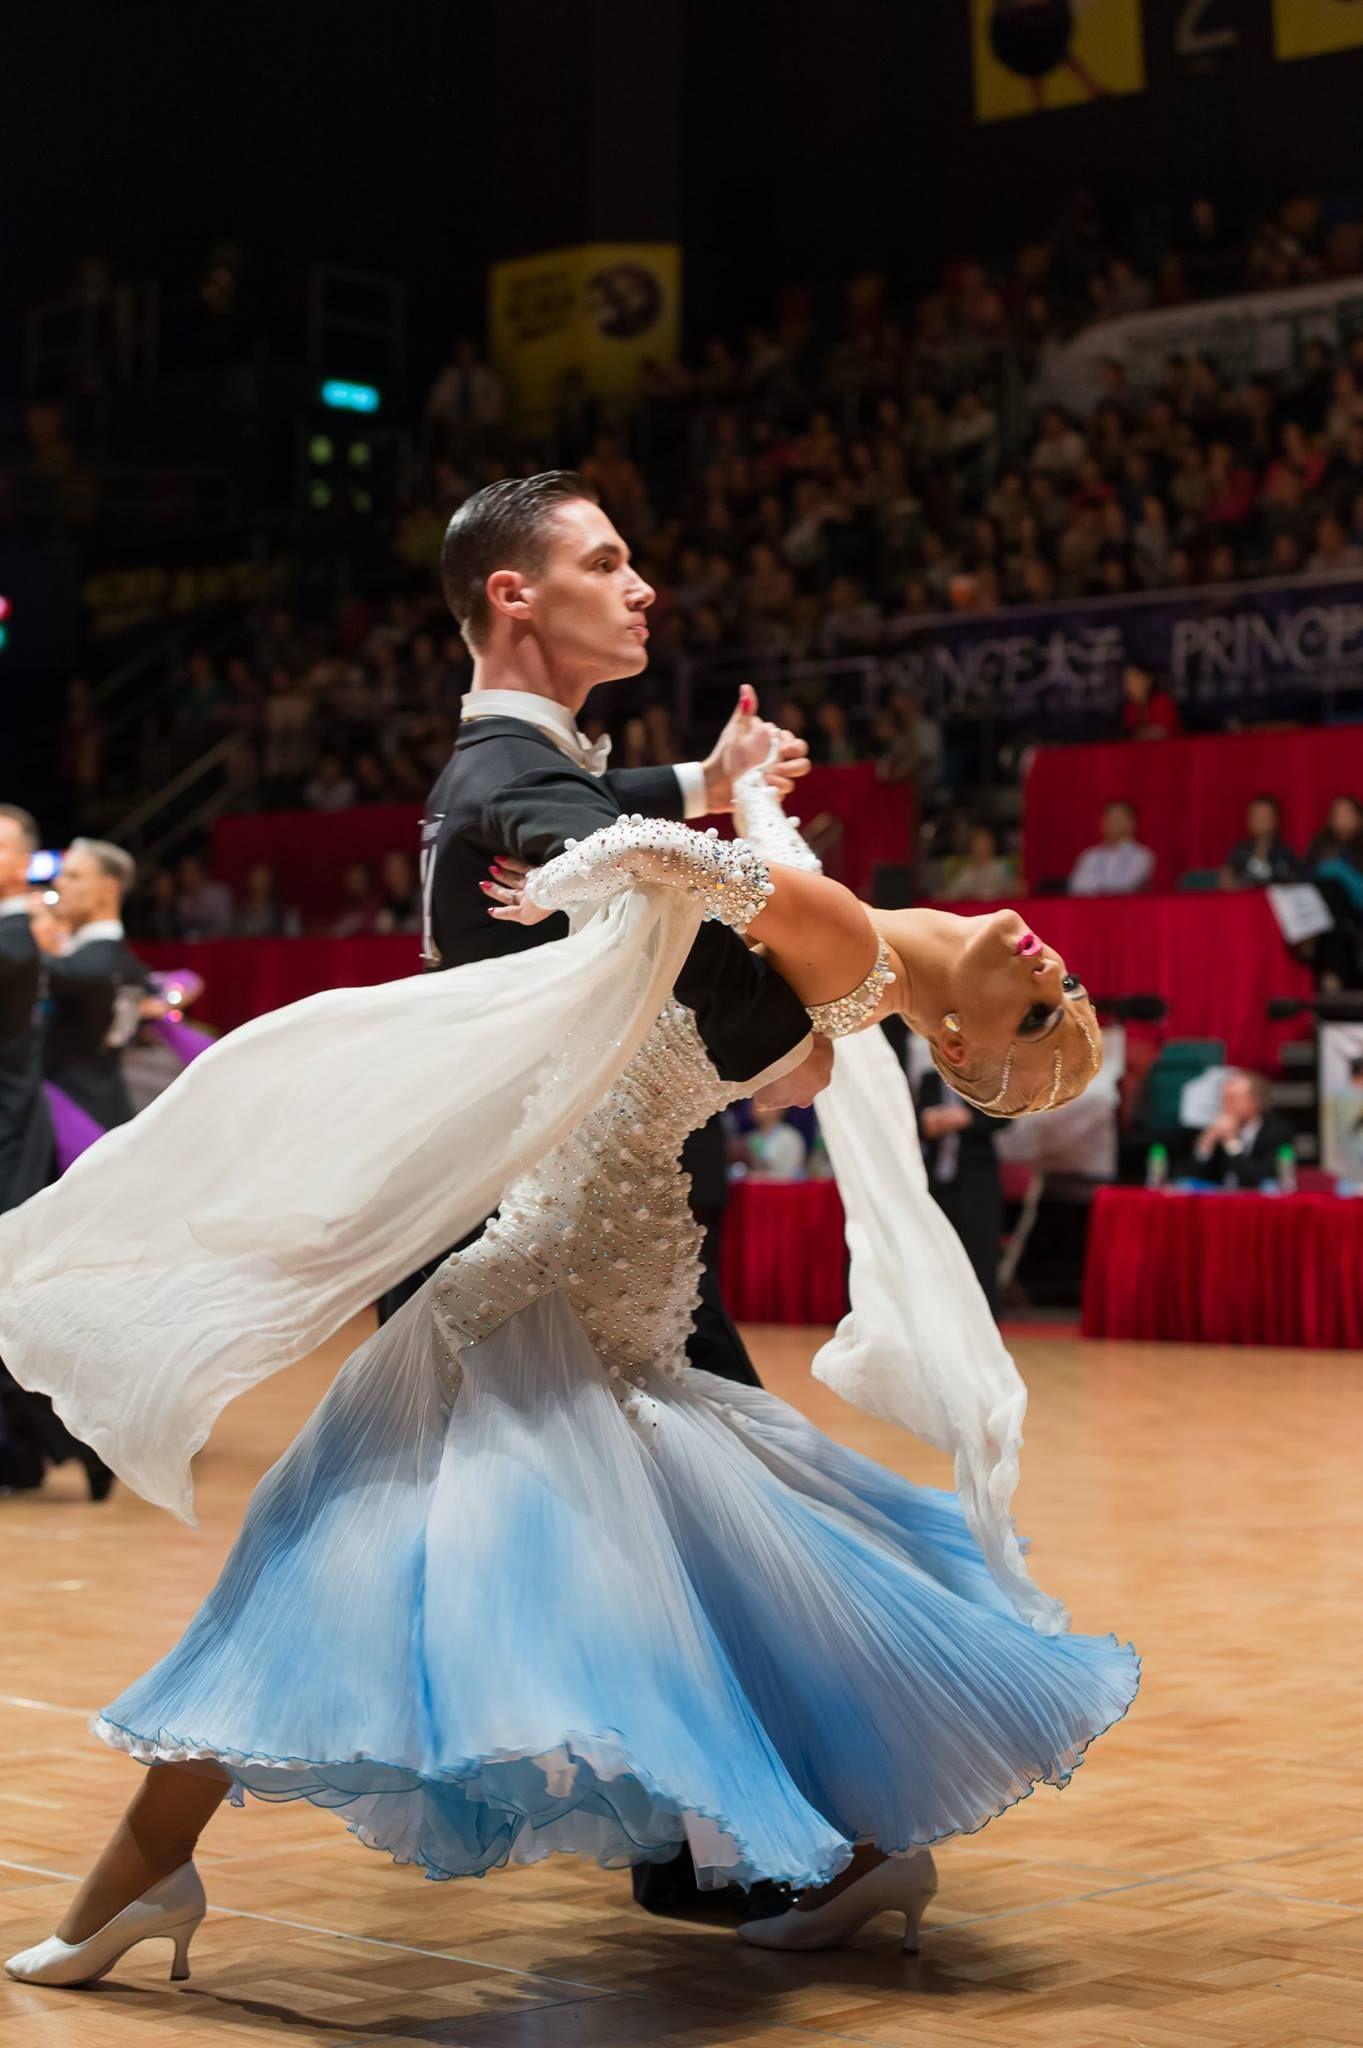 Dmitri Kolobov and Signe Busk 2014 | Бальные танцы, Танцы